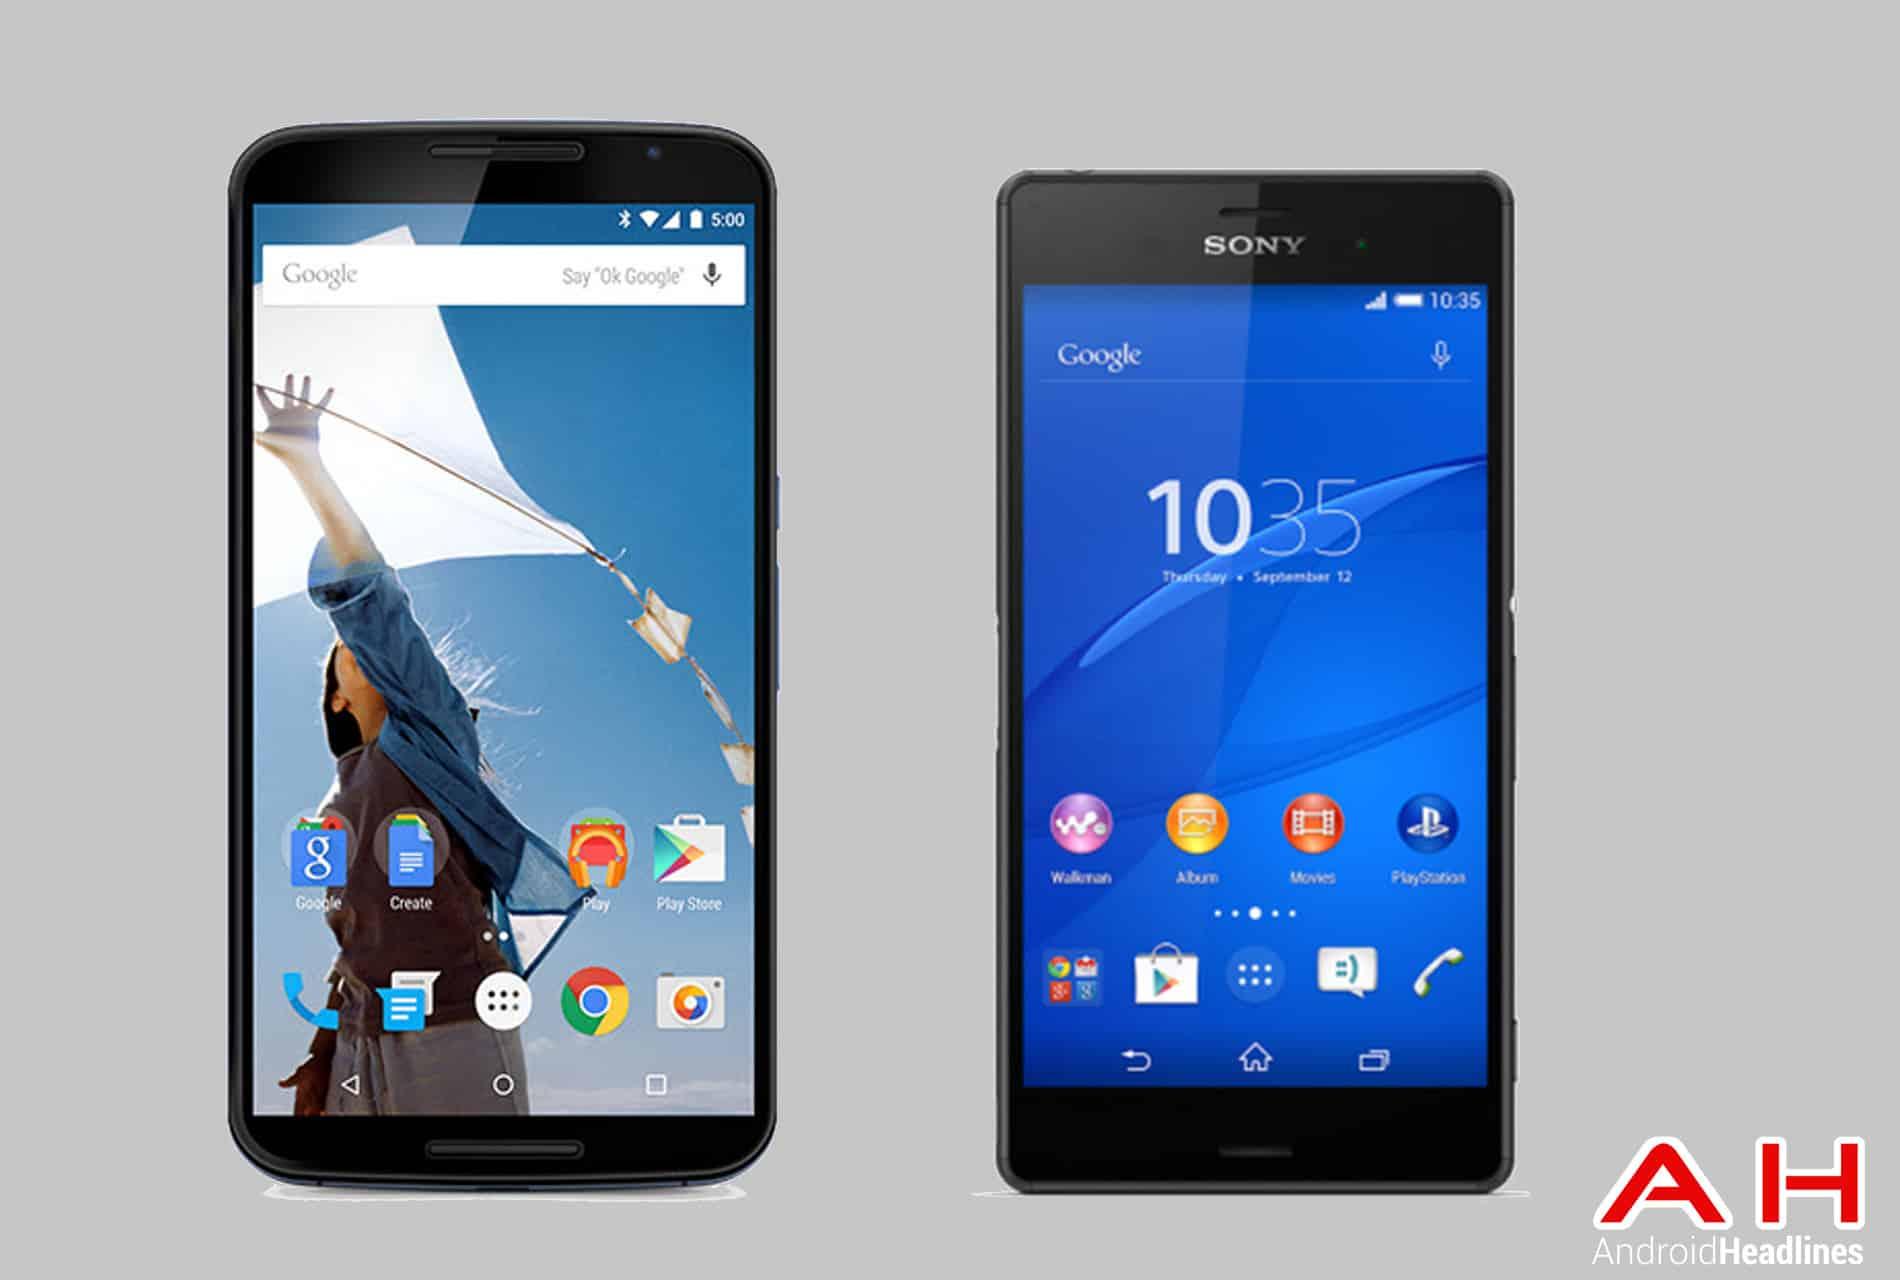 Nexus 6 vs Xperia Z3 AH